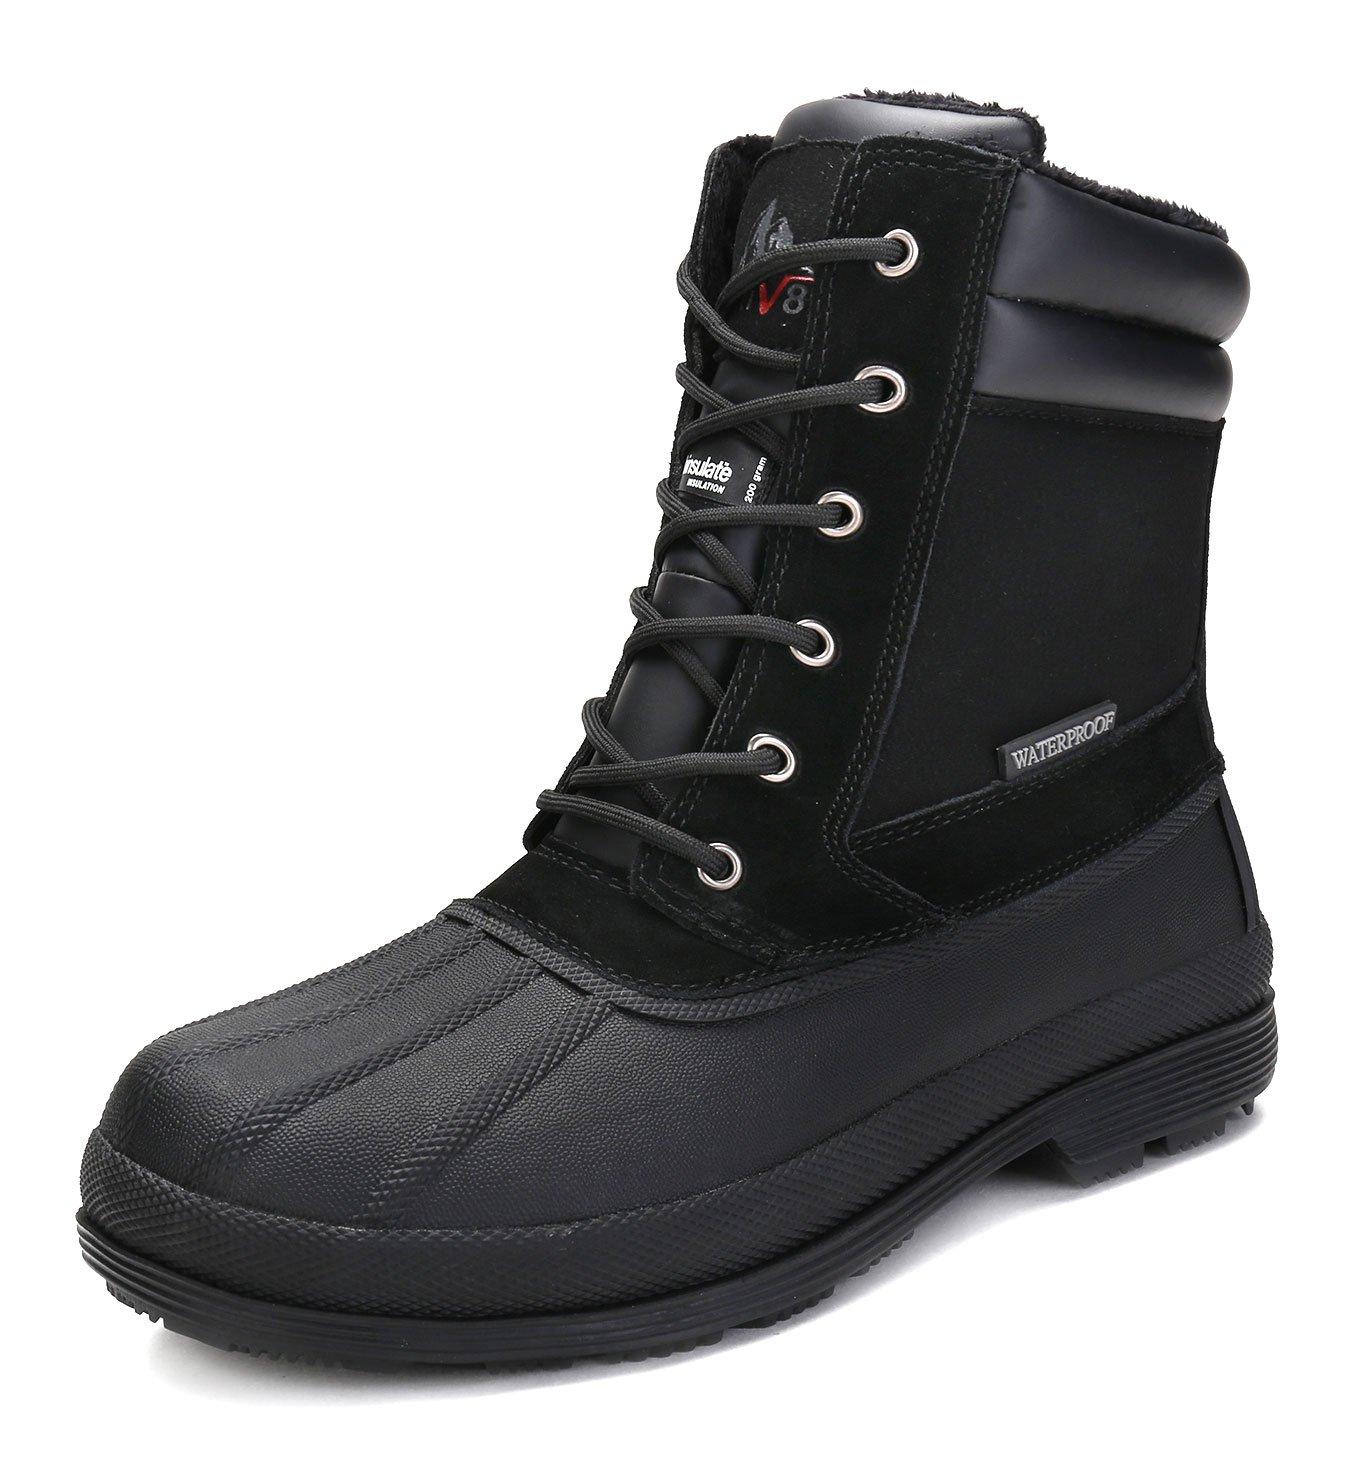 arctiv8 Men's nortiv8 170391-M Black Insulated Waterproof Work Snow Boots Size 14 M US